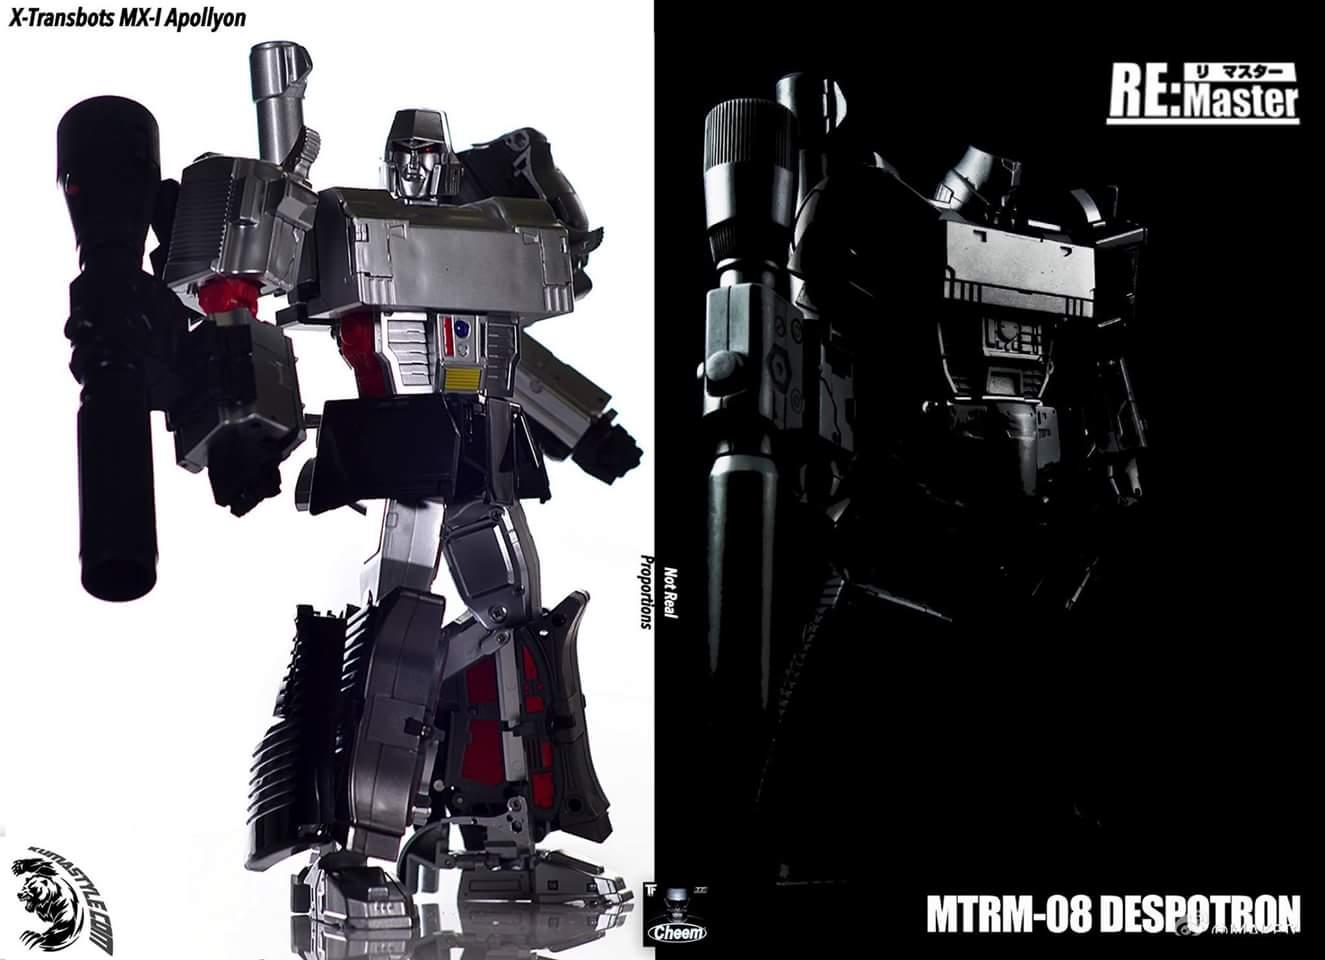 [Masterpiece Tiers] MAKETOYS MTRM-08 DESPOTRON aka MEGATRON - Sortie ??? MB1GiTGS